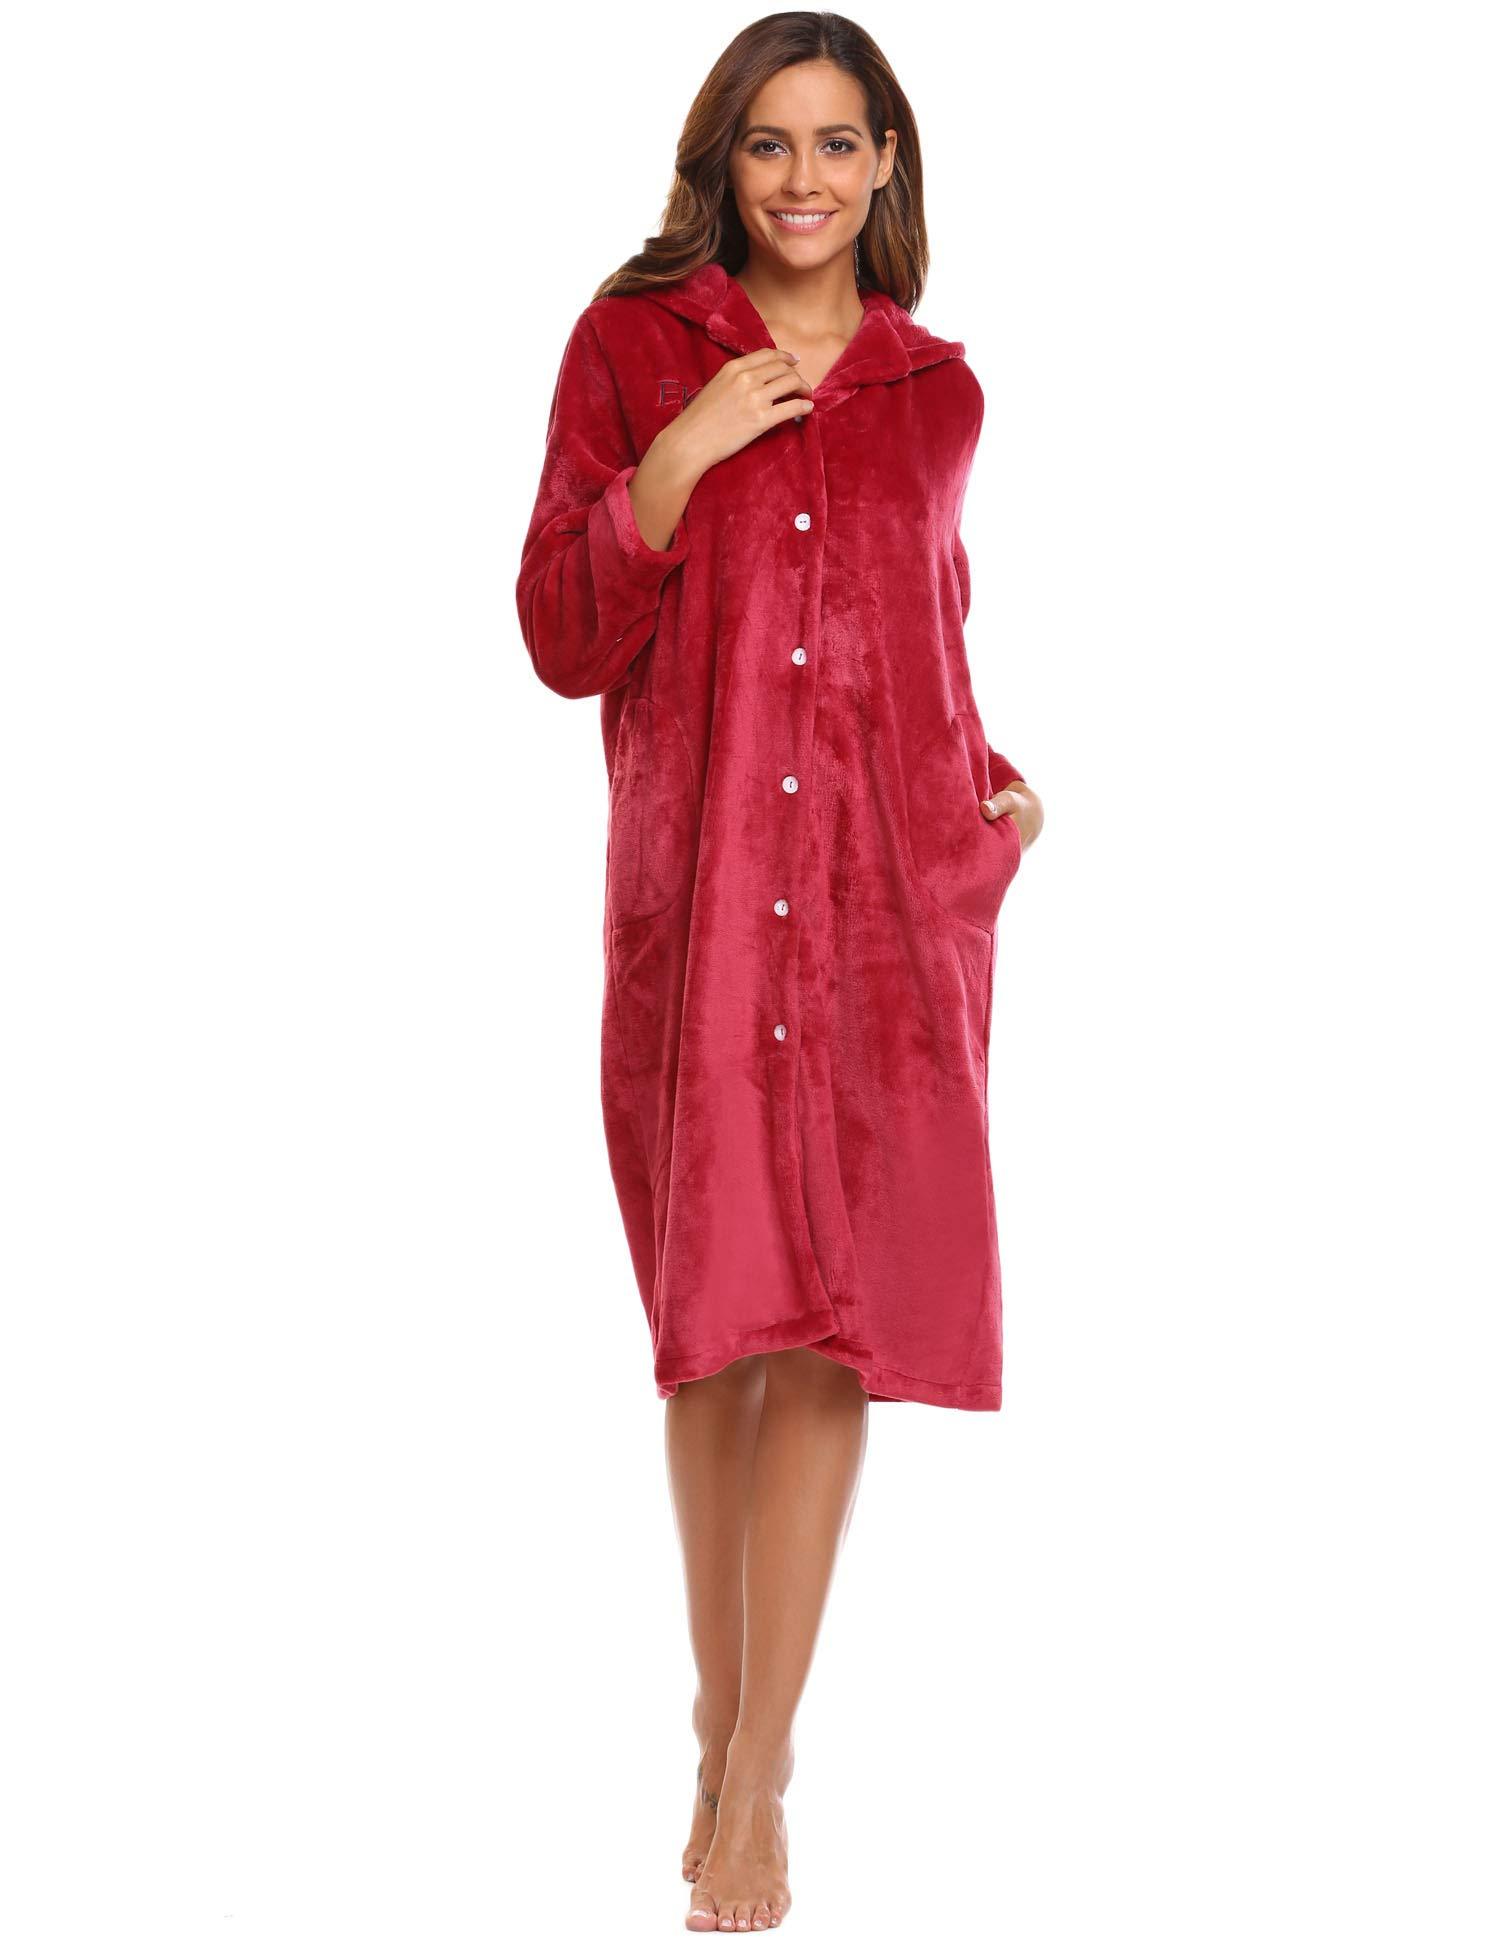 Ekouaer Hooded Robes Women Fleece Housecoat Thick Bathrobe Warm Robecoat Plush Wrap Robe with Pockets Winter Nightgown S-XXL